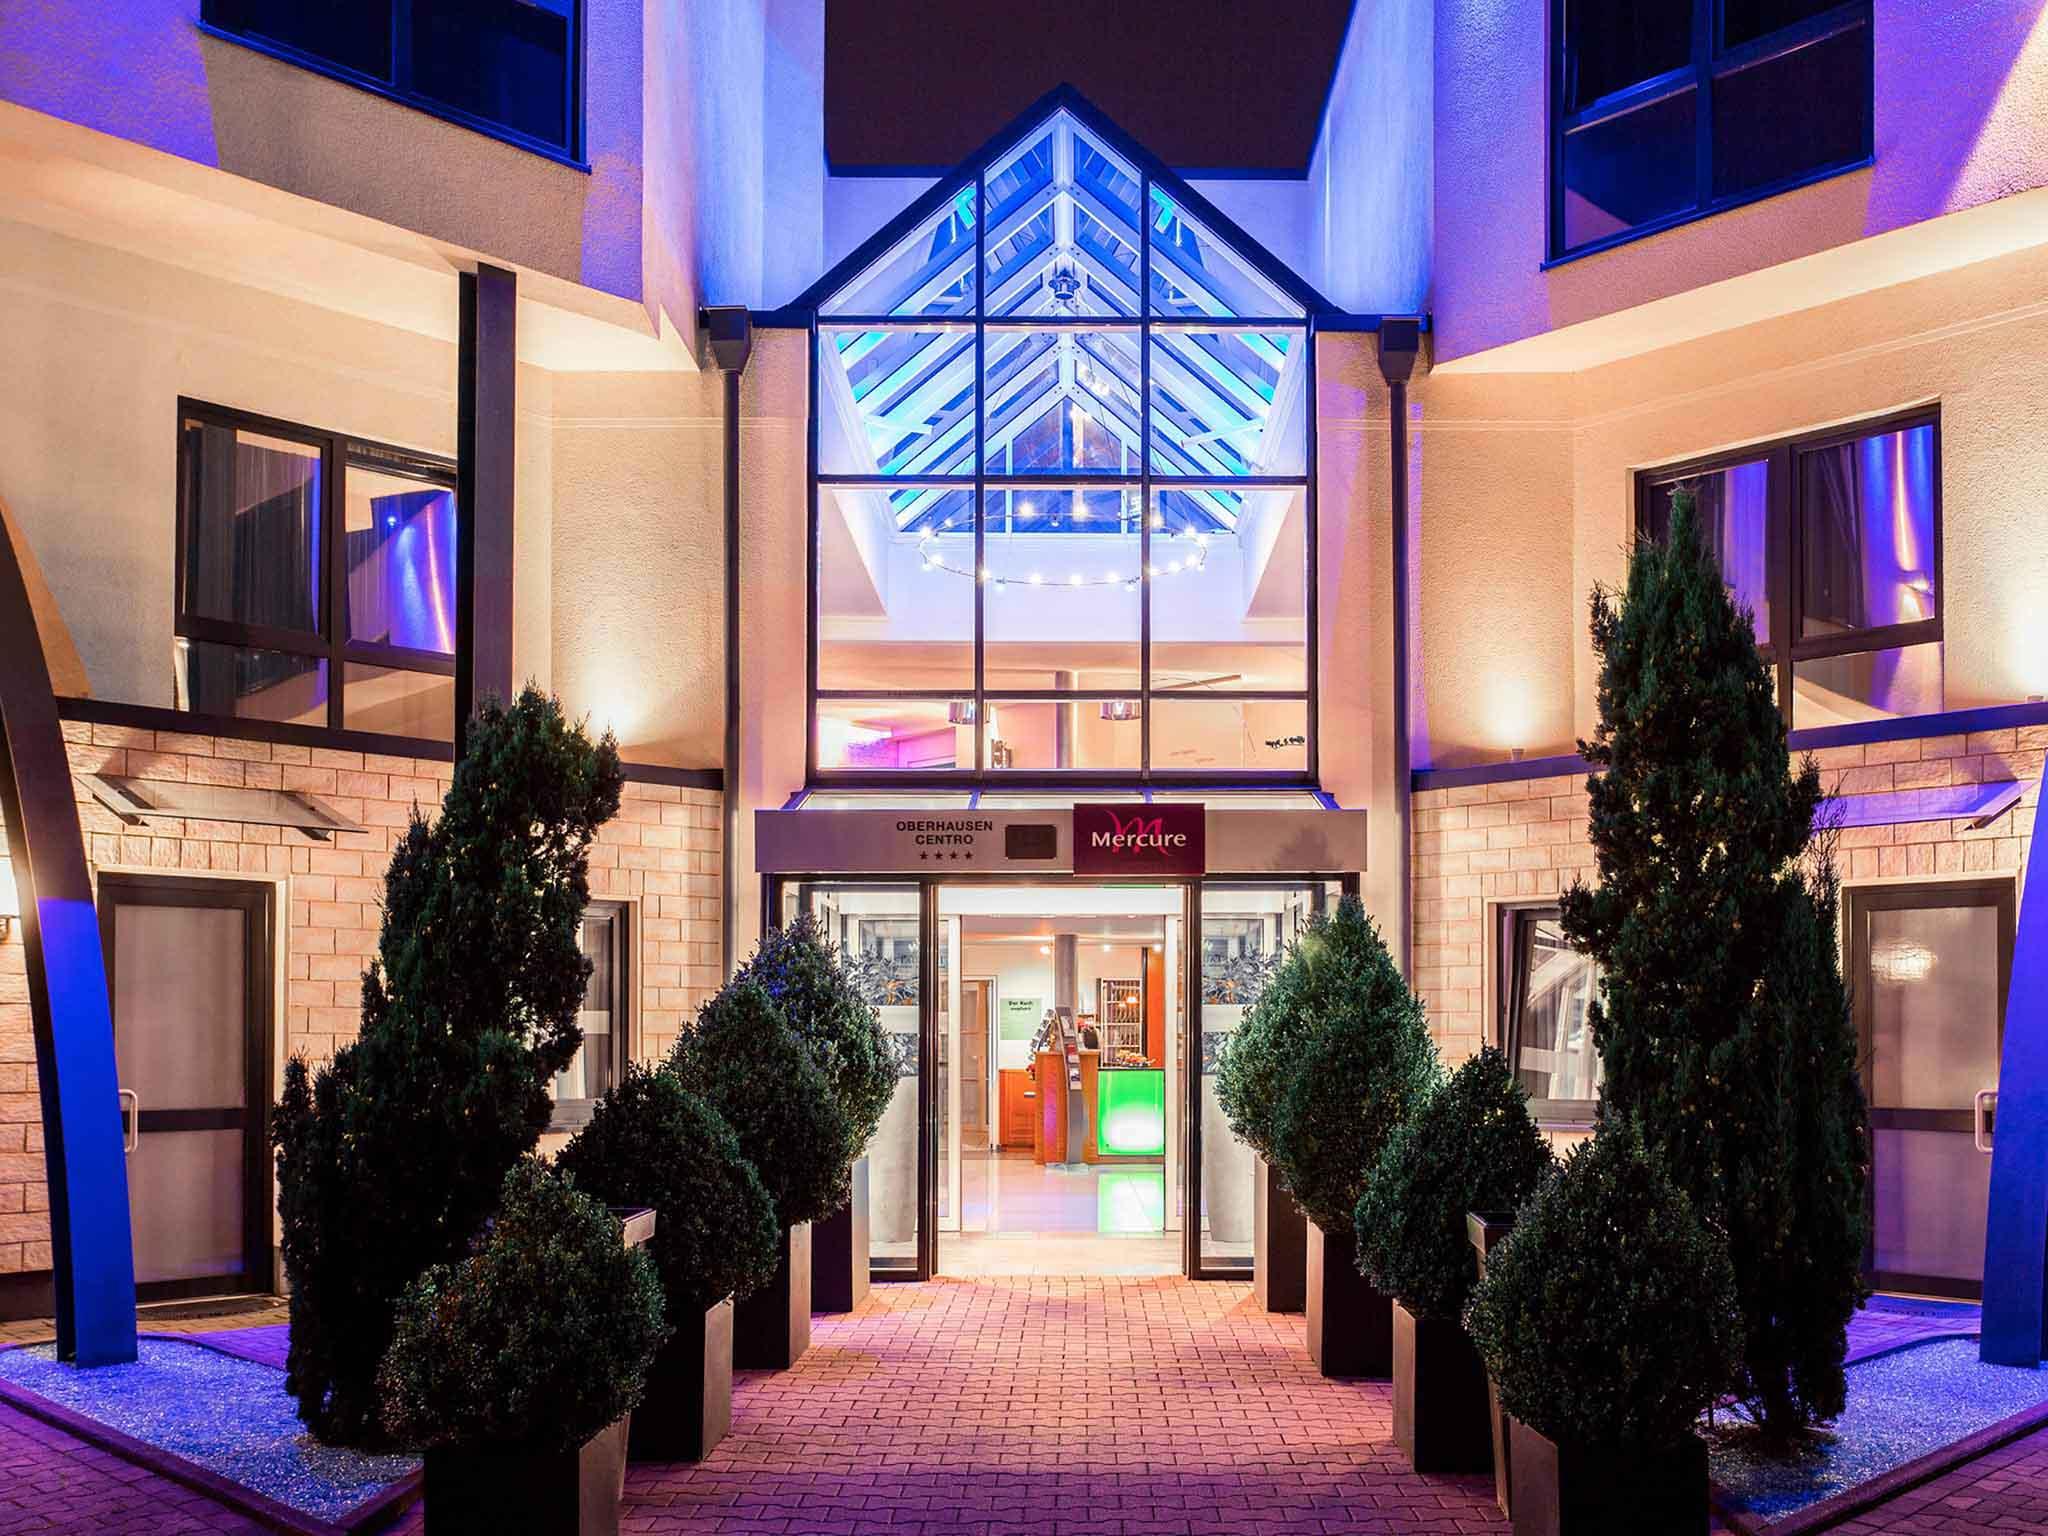 Hotel - Mercure Hotel am Centro Oberhausen